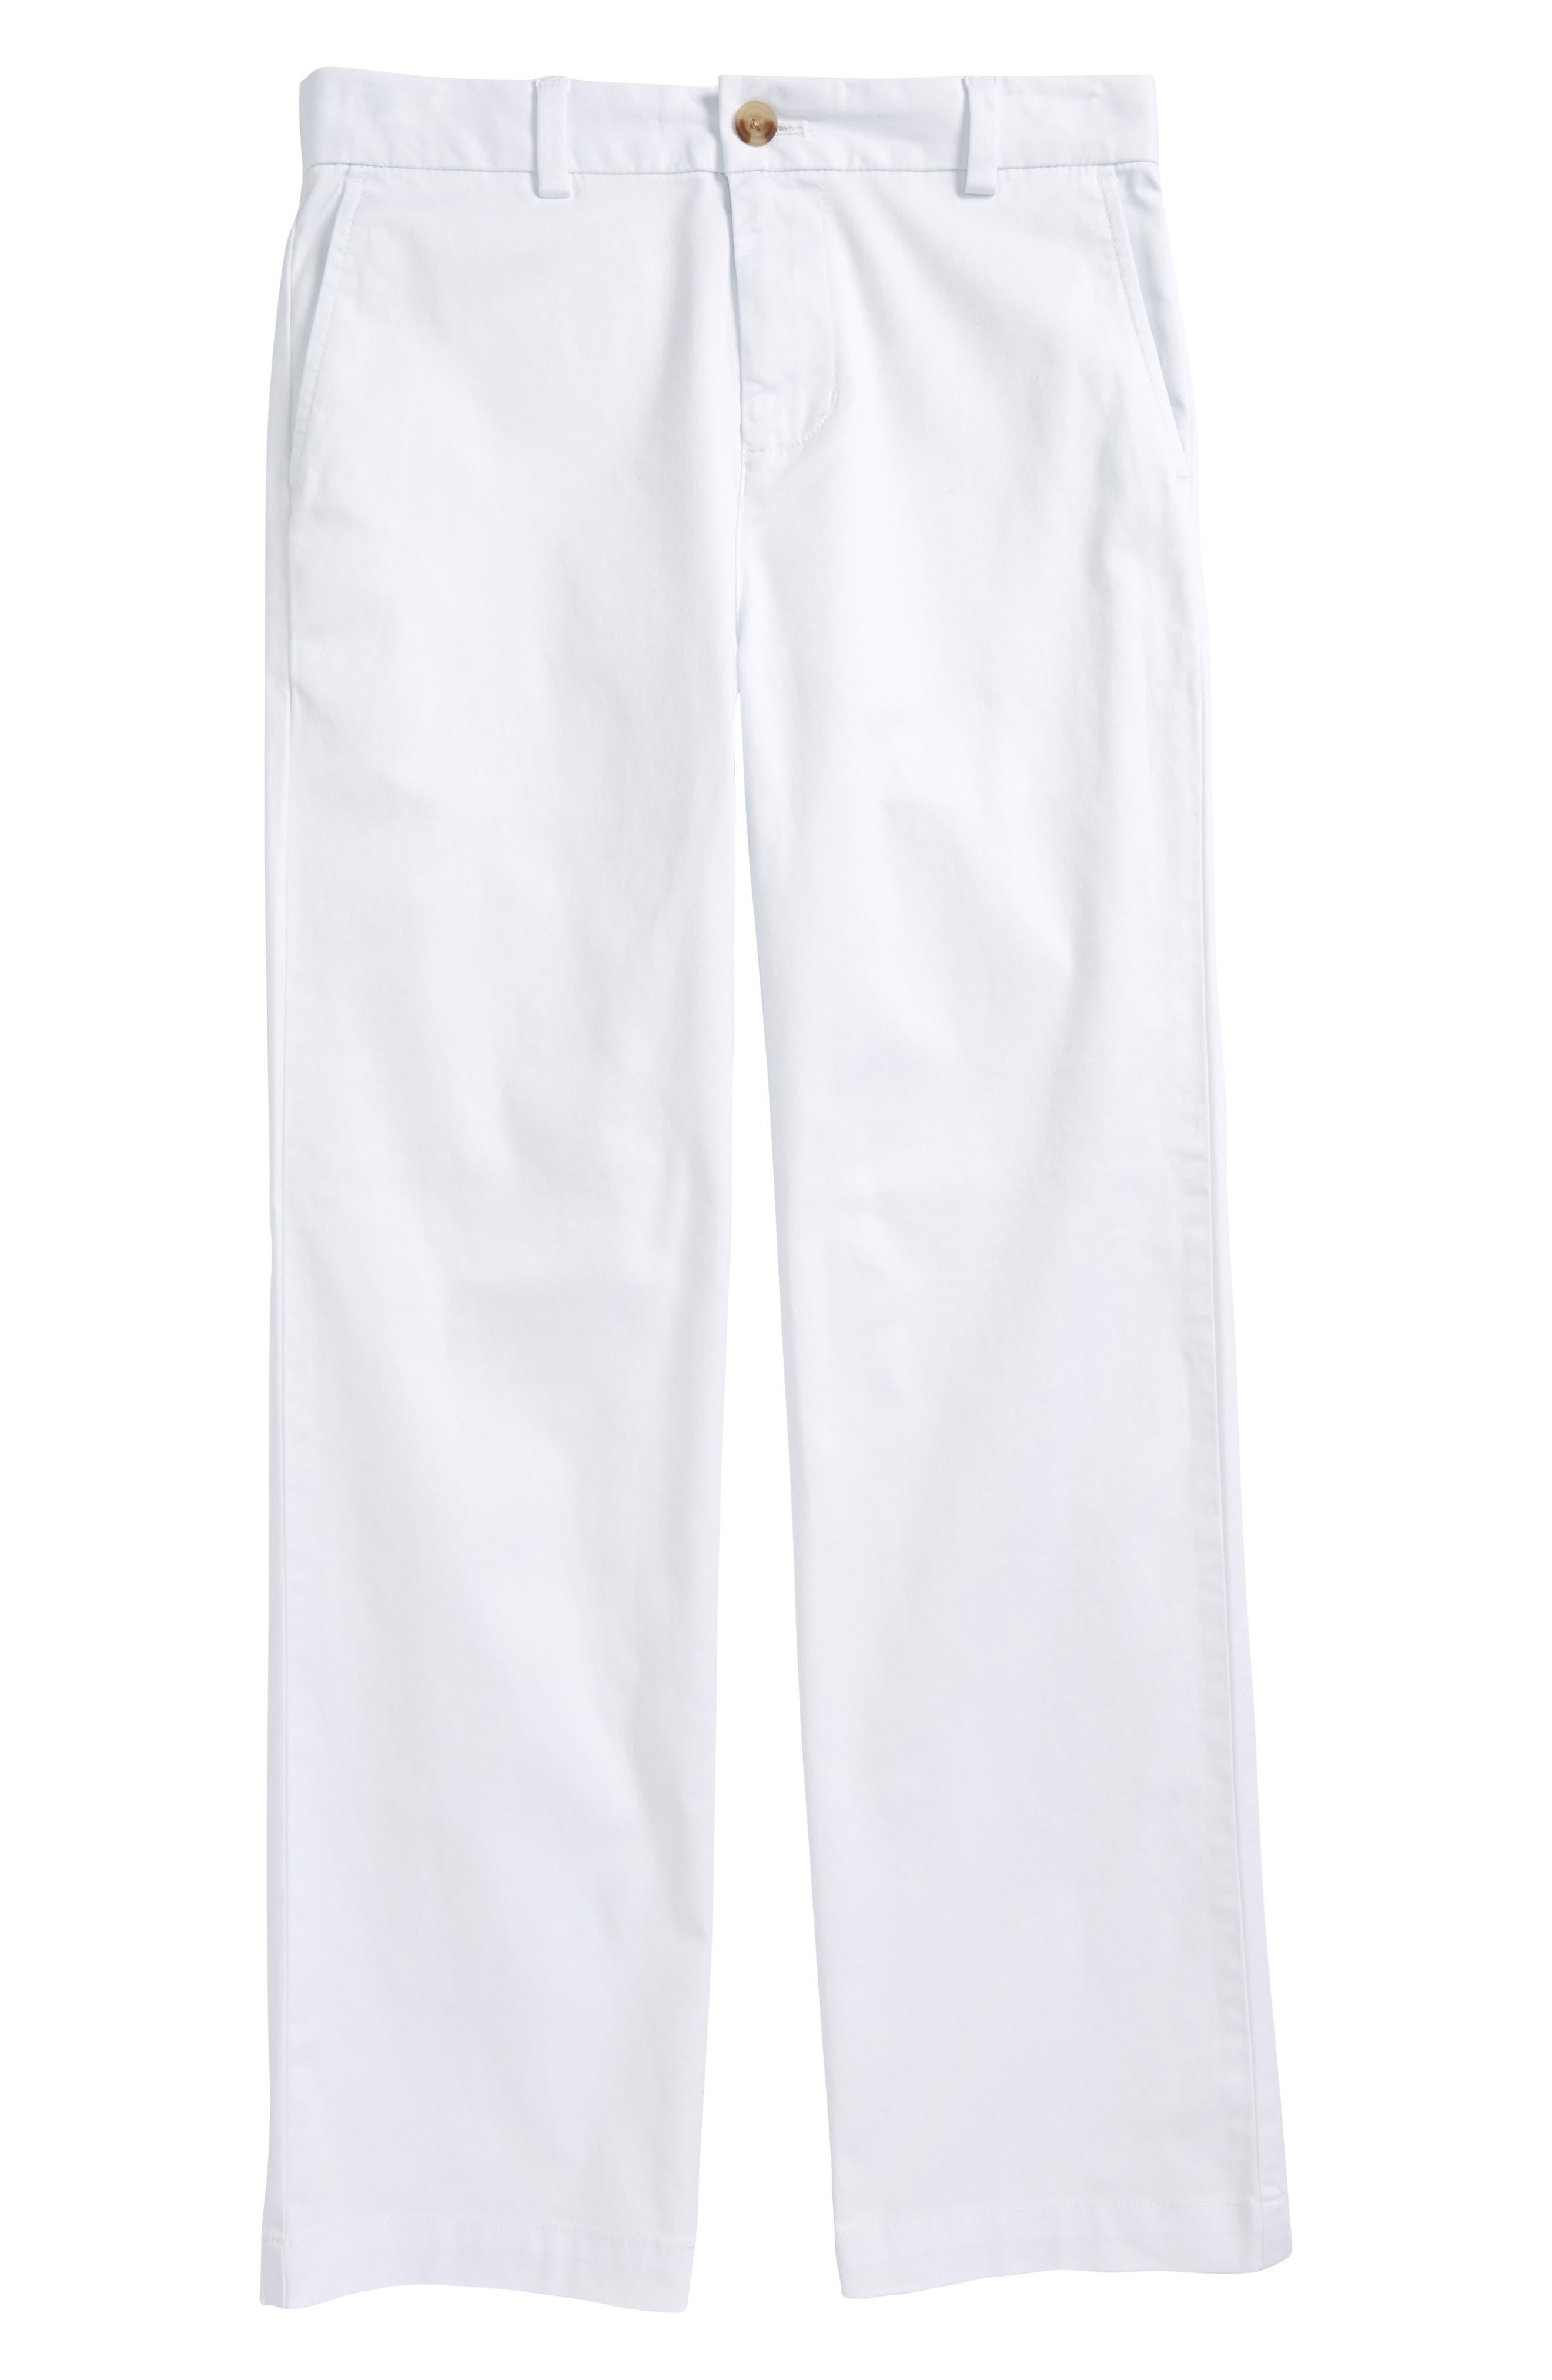 Breaker Pants,                         Main,                         color, WHITE CAP